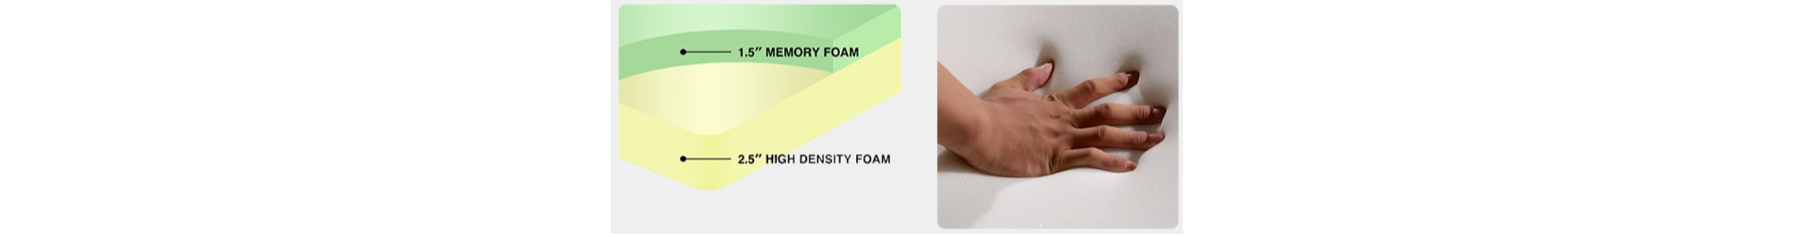 High Density Foam Cold Cured High Density